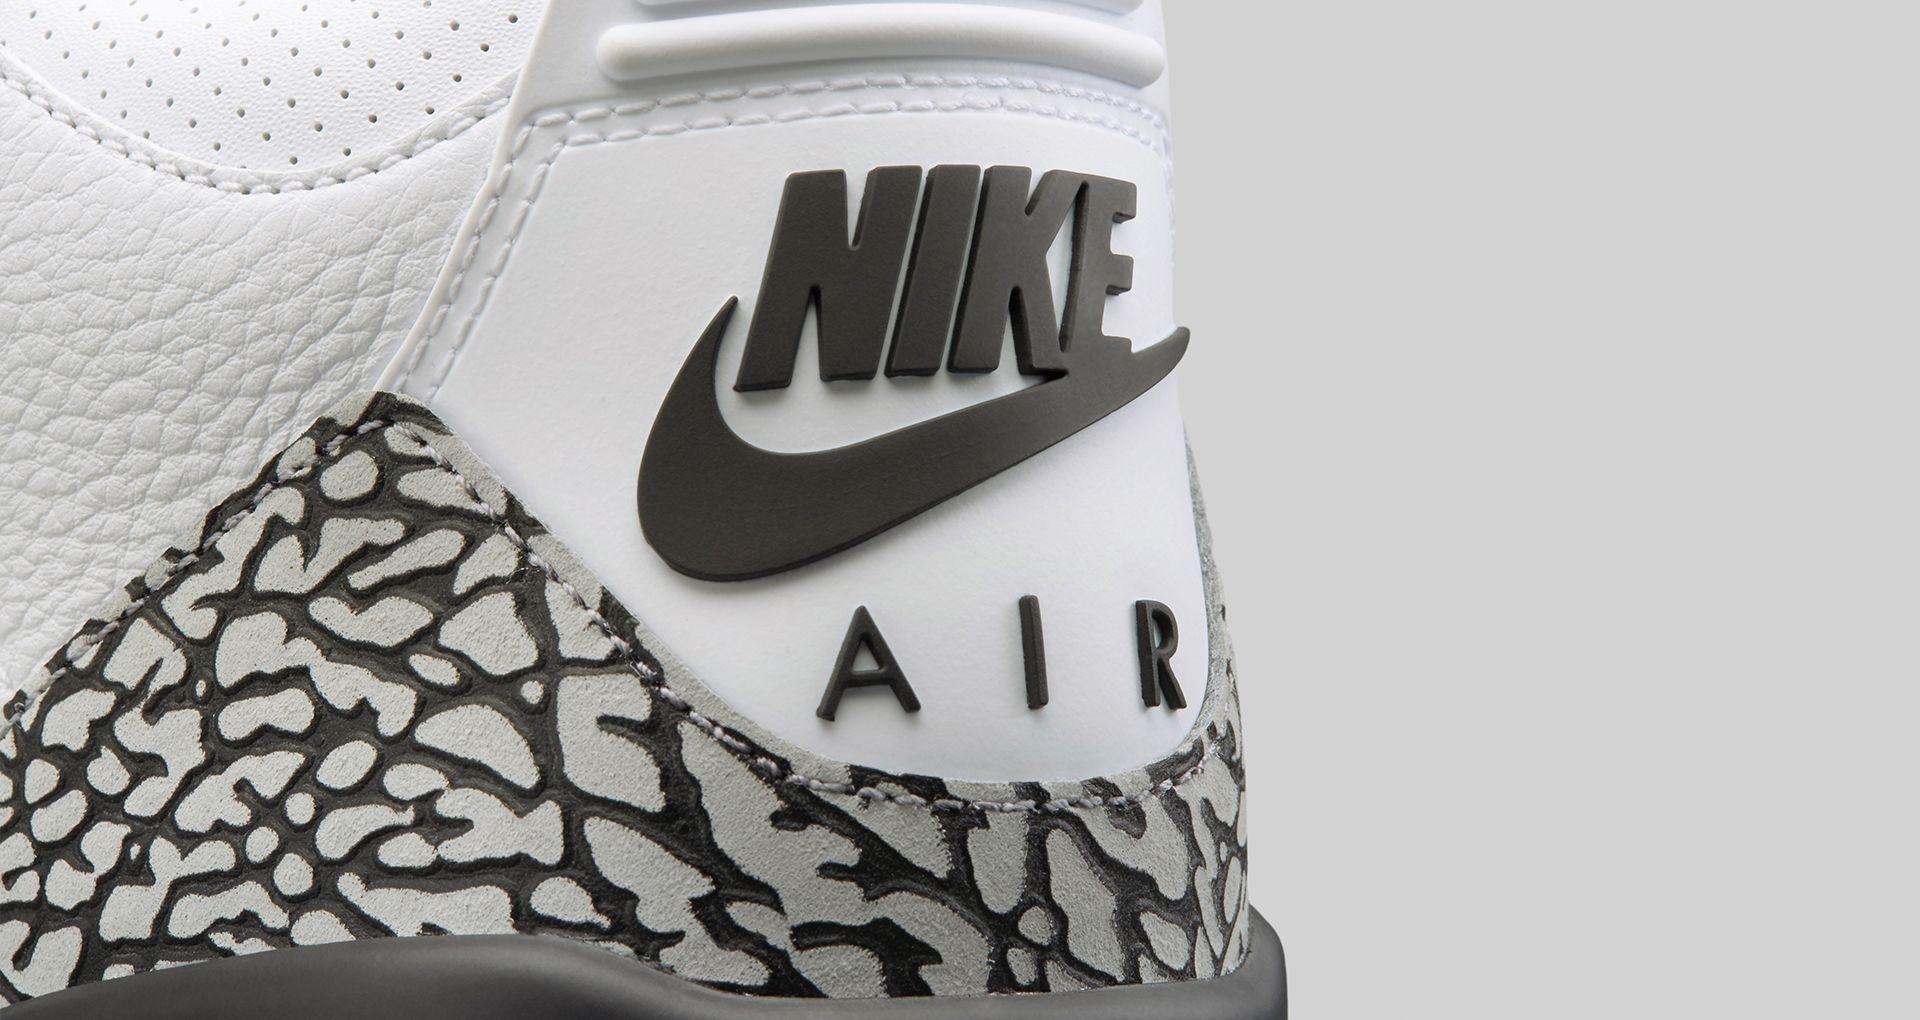 269c4b7a2bb8 Air Jordan 3  Free Throw Line  Release Date. Nike+ SNKRS